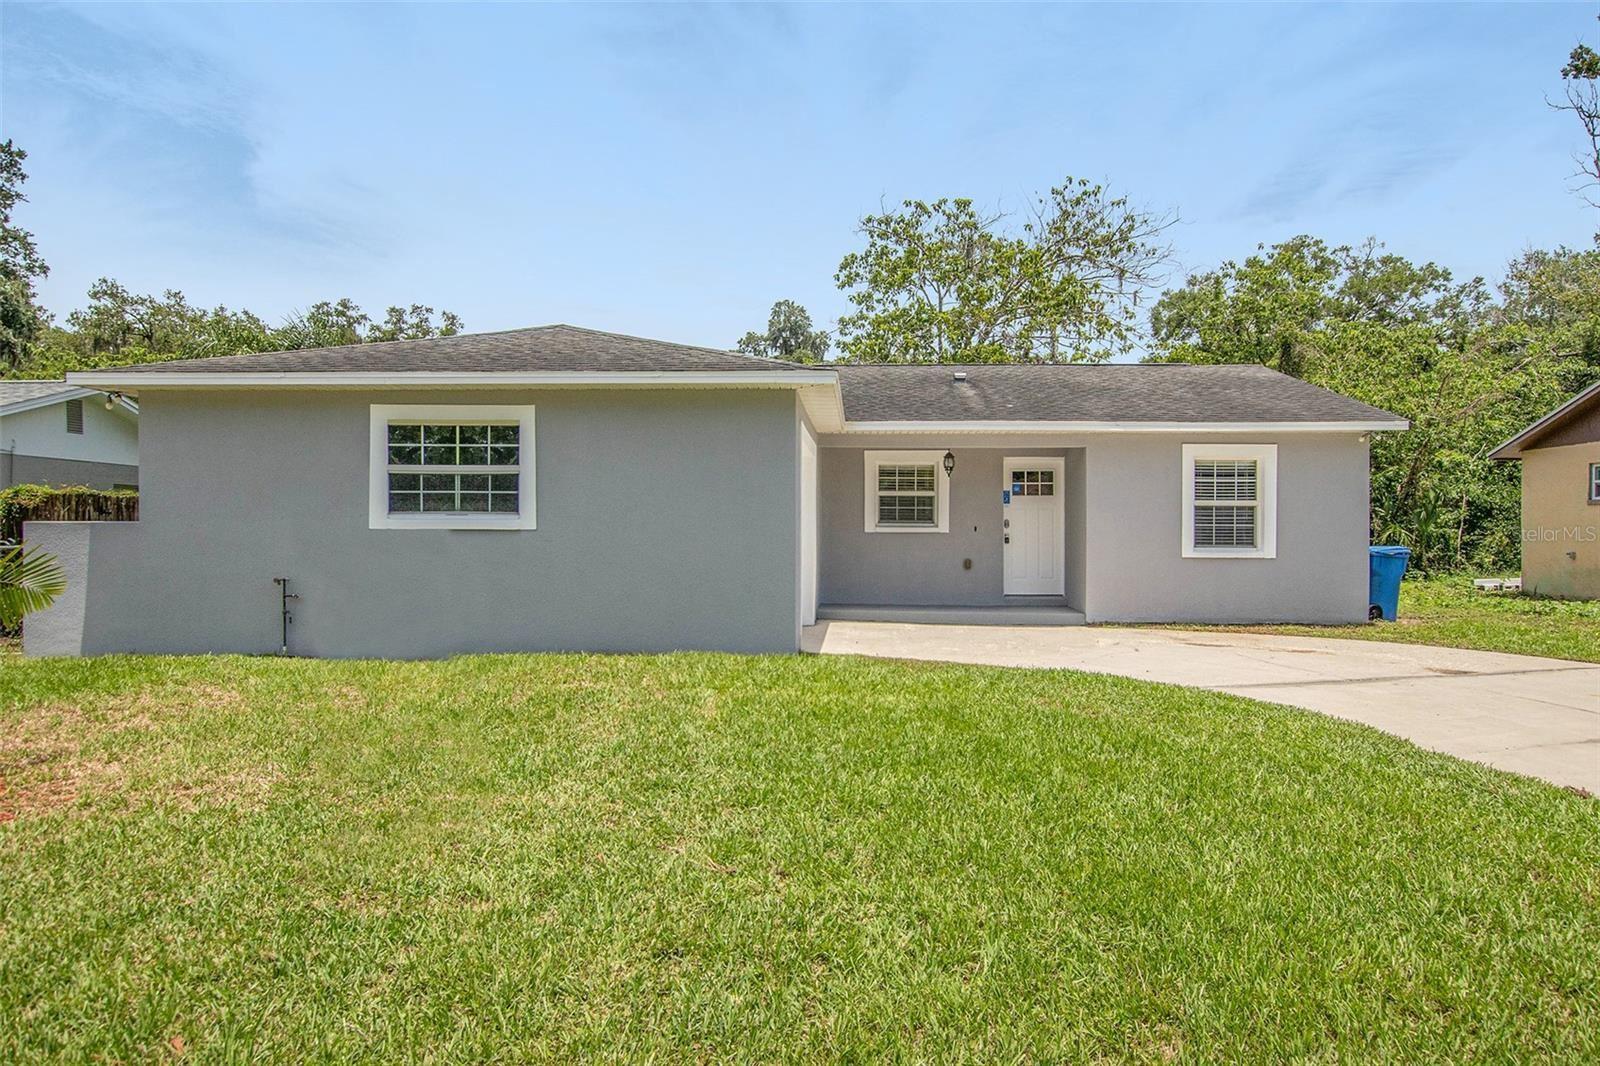 560 ROBIN HILL CIRCLE, Brandon, FL 33510 - MLS#: O5955917